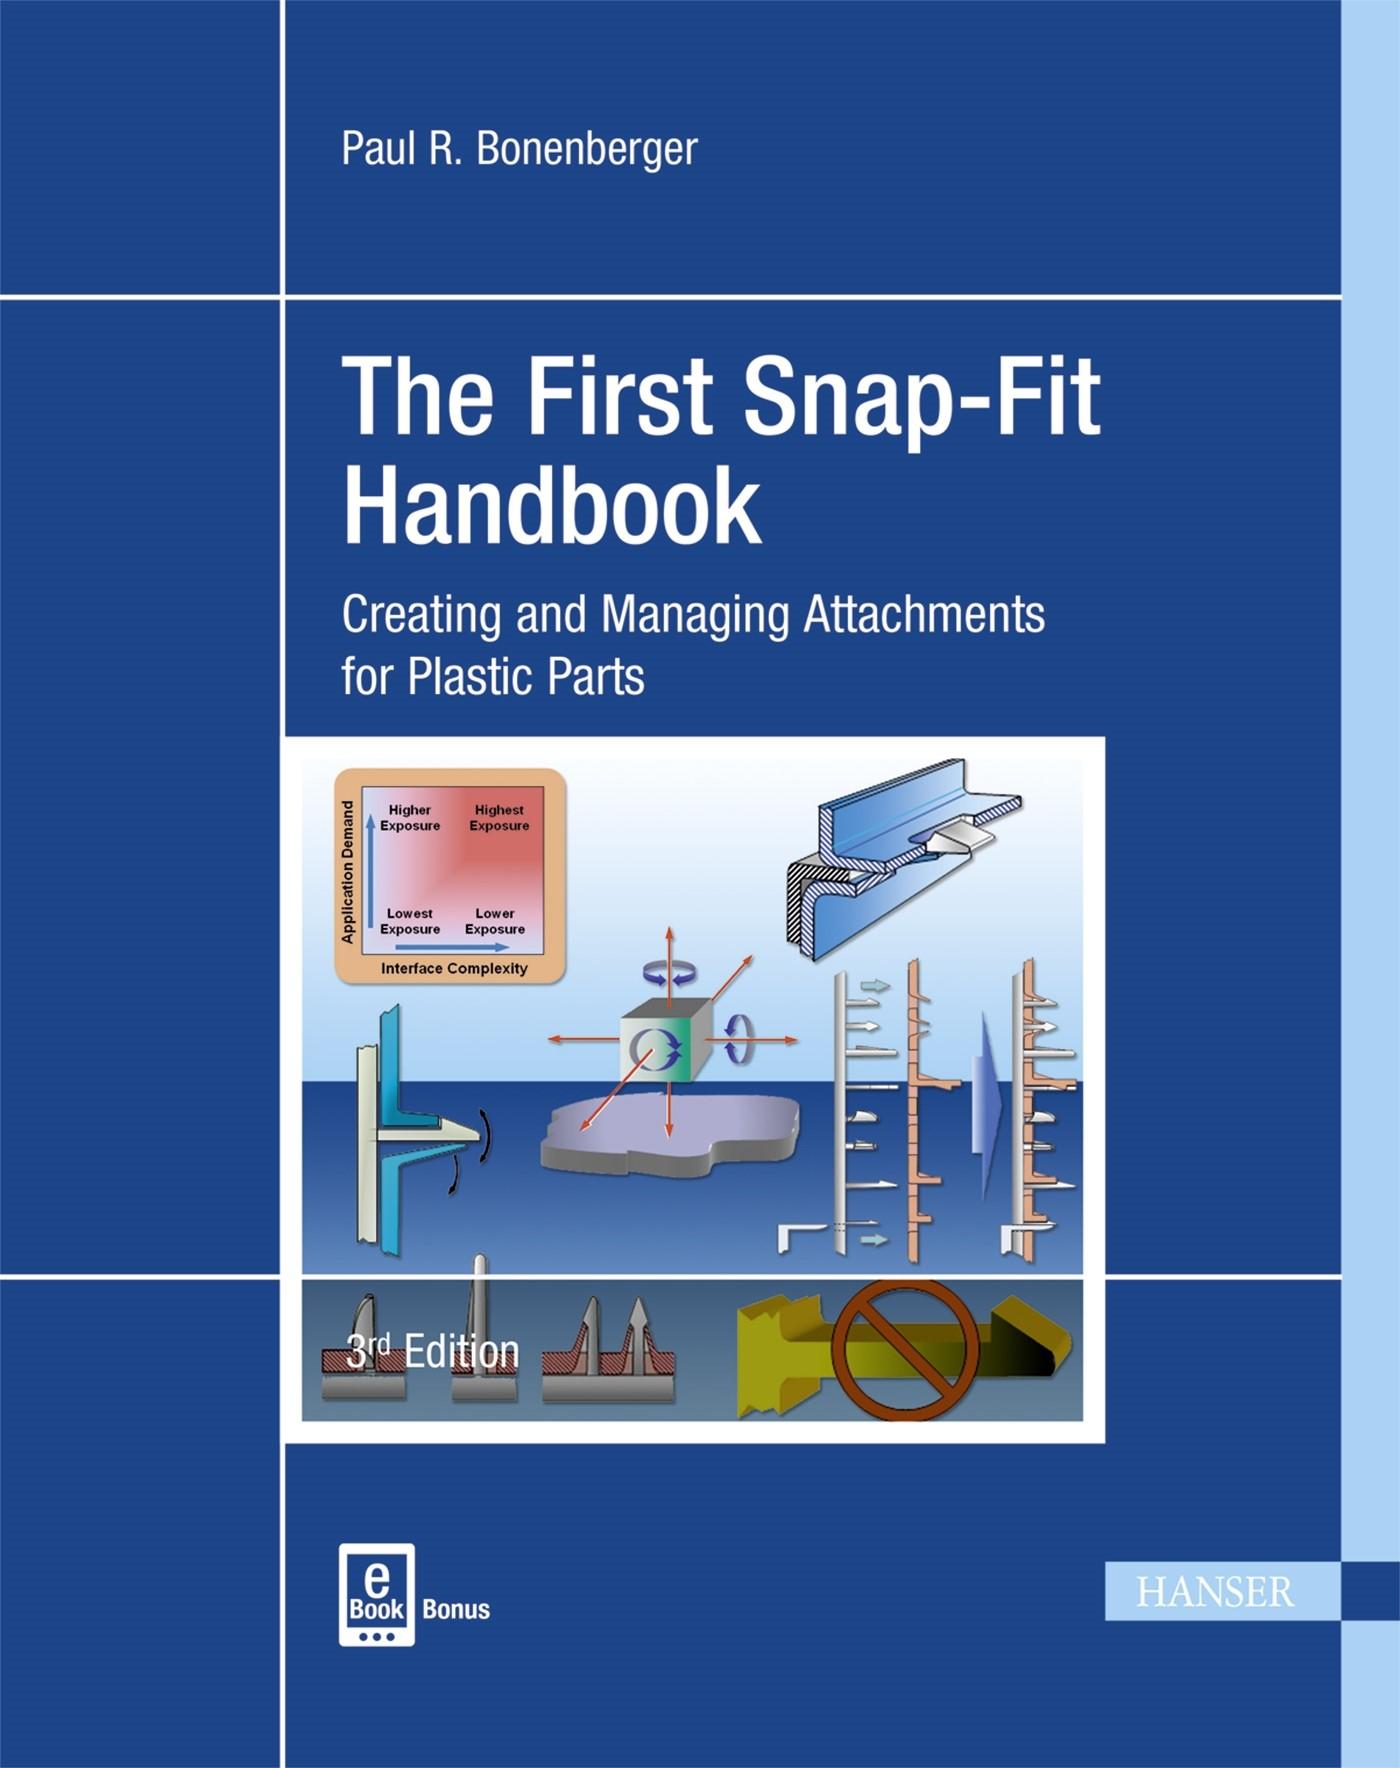 The First Snap-Fit Handbook | Bonenberger | 3. Auflage., 2016 | Buch (Cover)